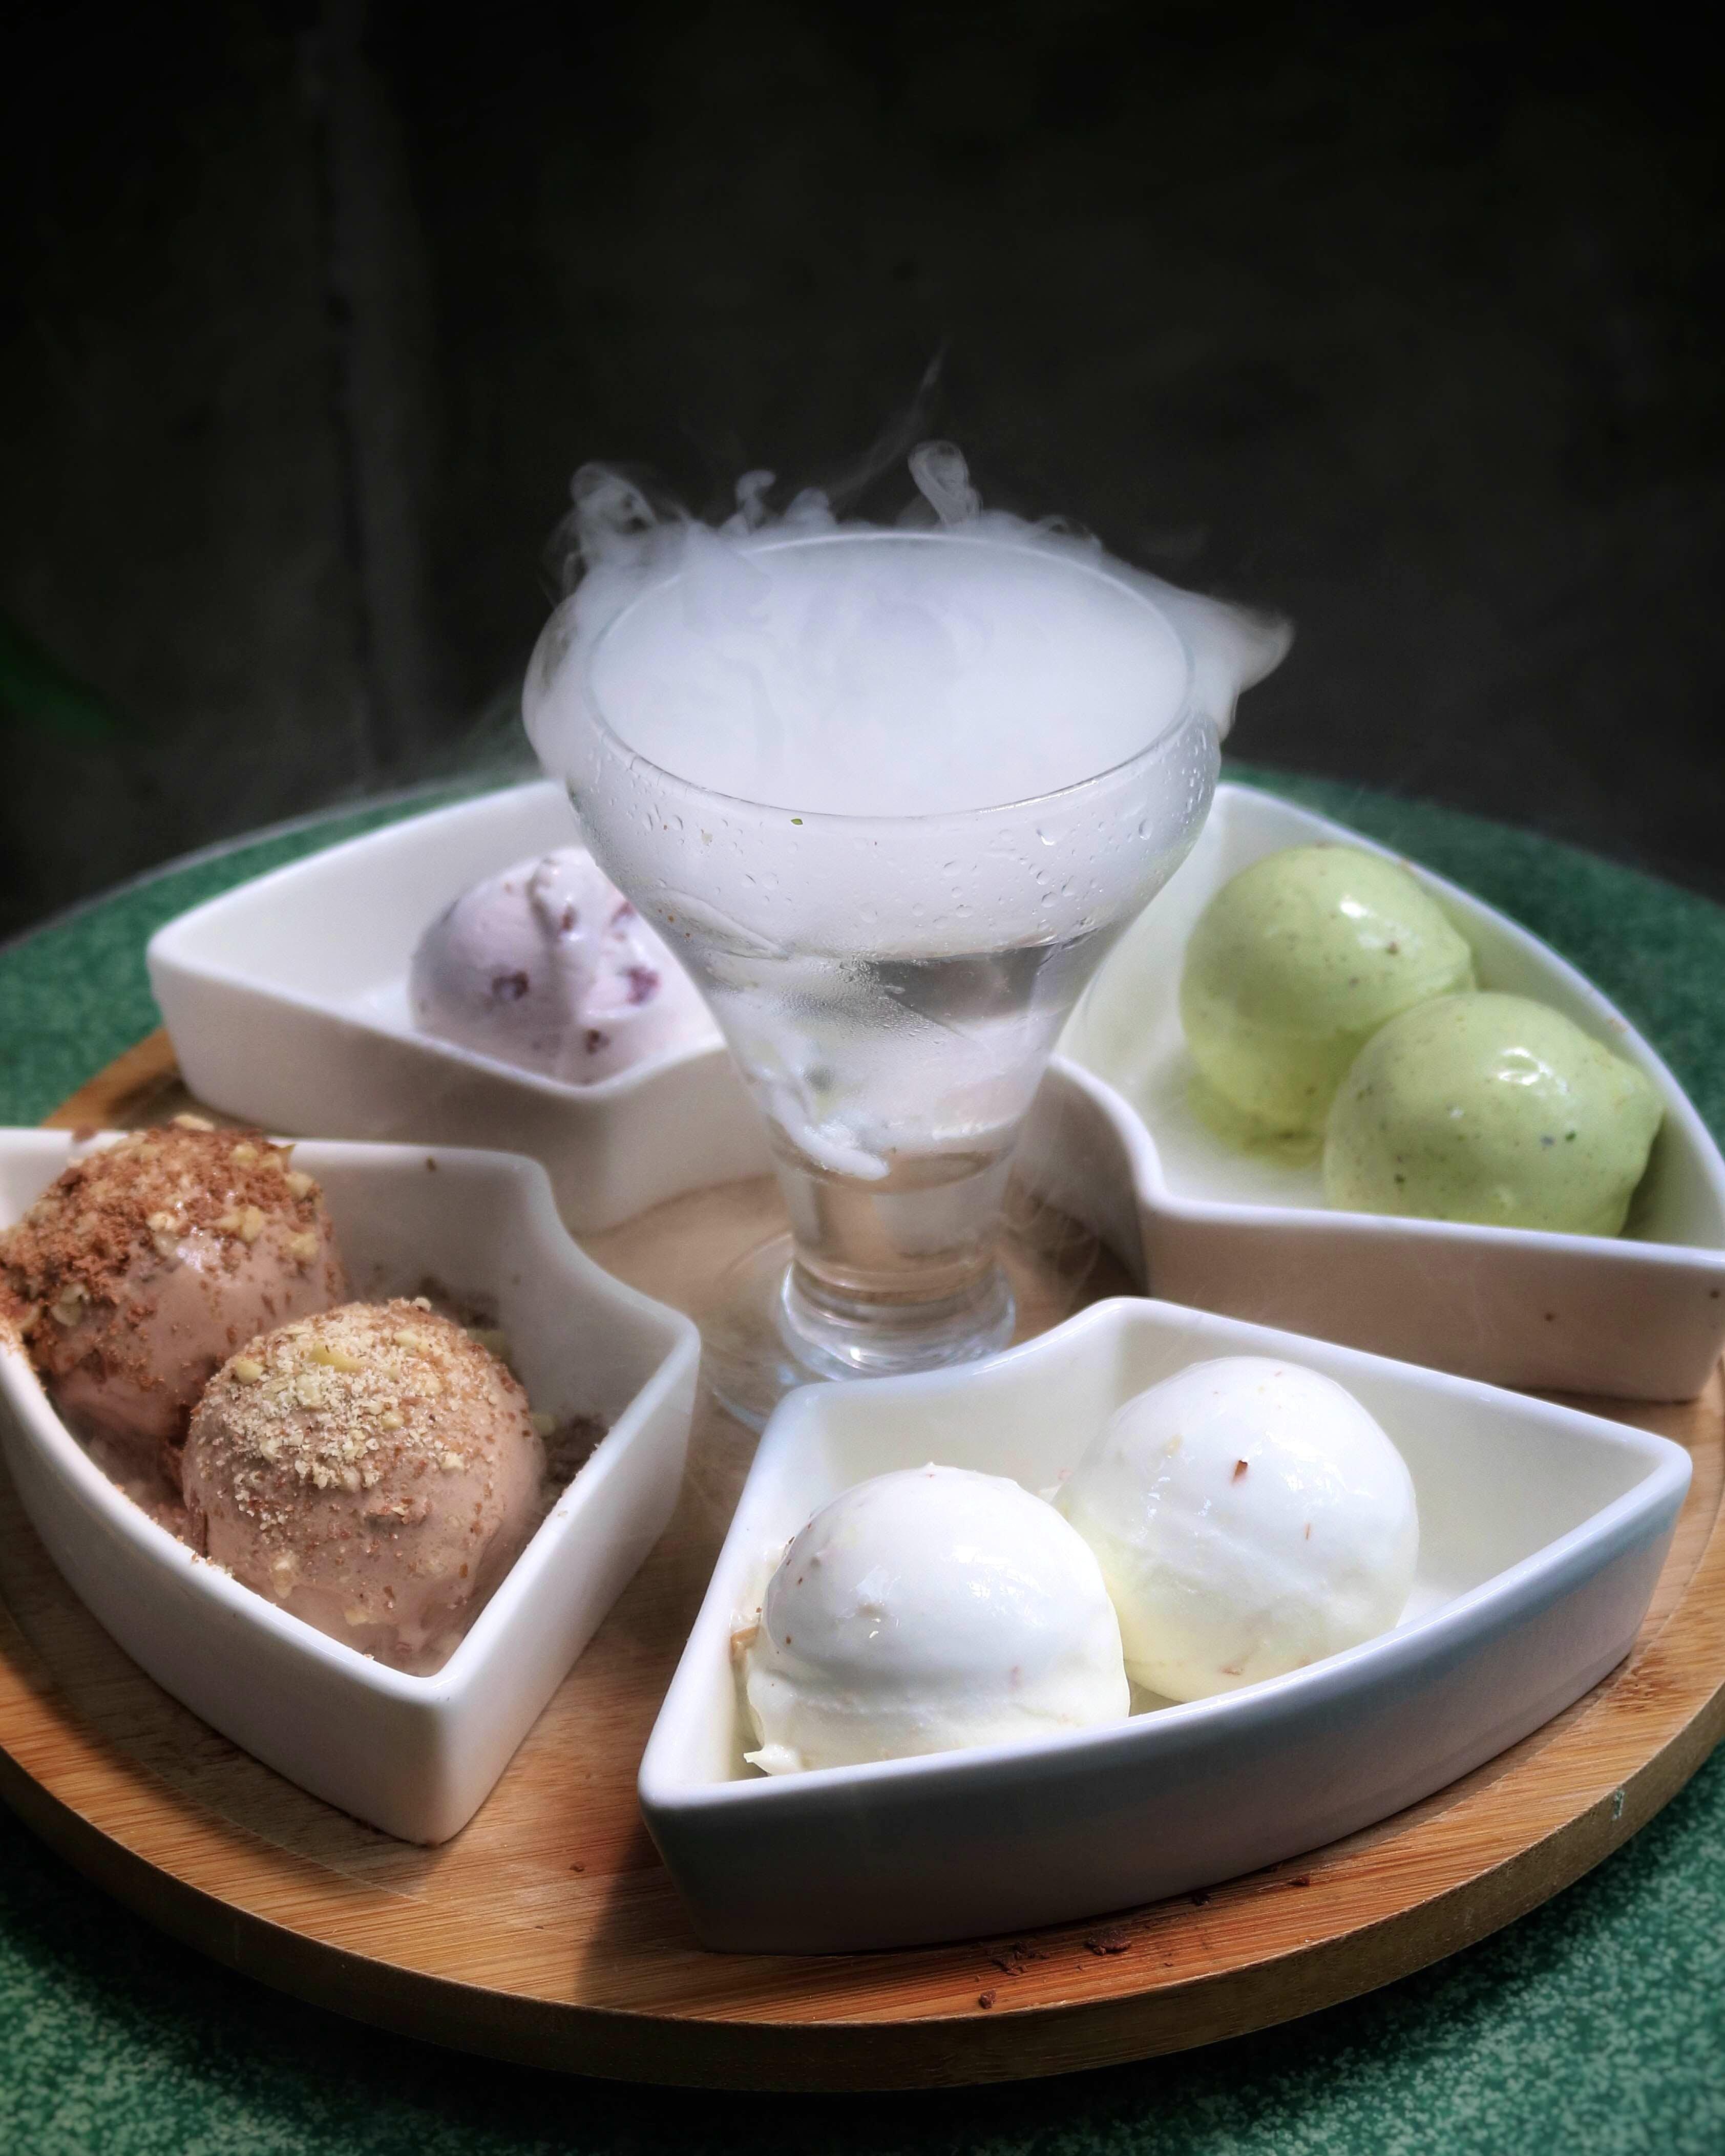 Food,Cuisine,Dish,Mochi,Ingredient,Rice cake,Comfort food,Manjū,Dessert,Serveware